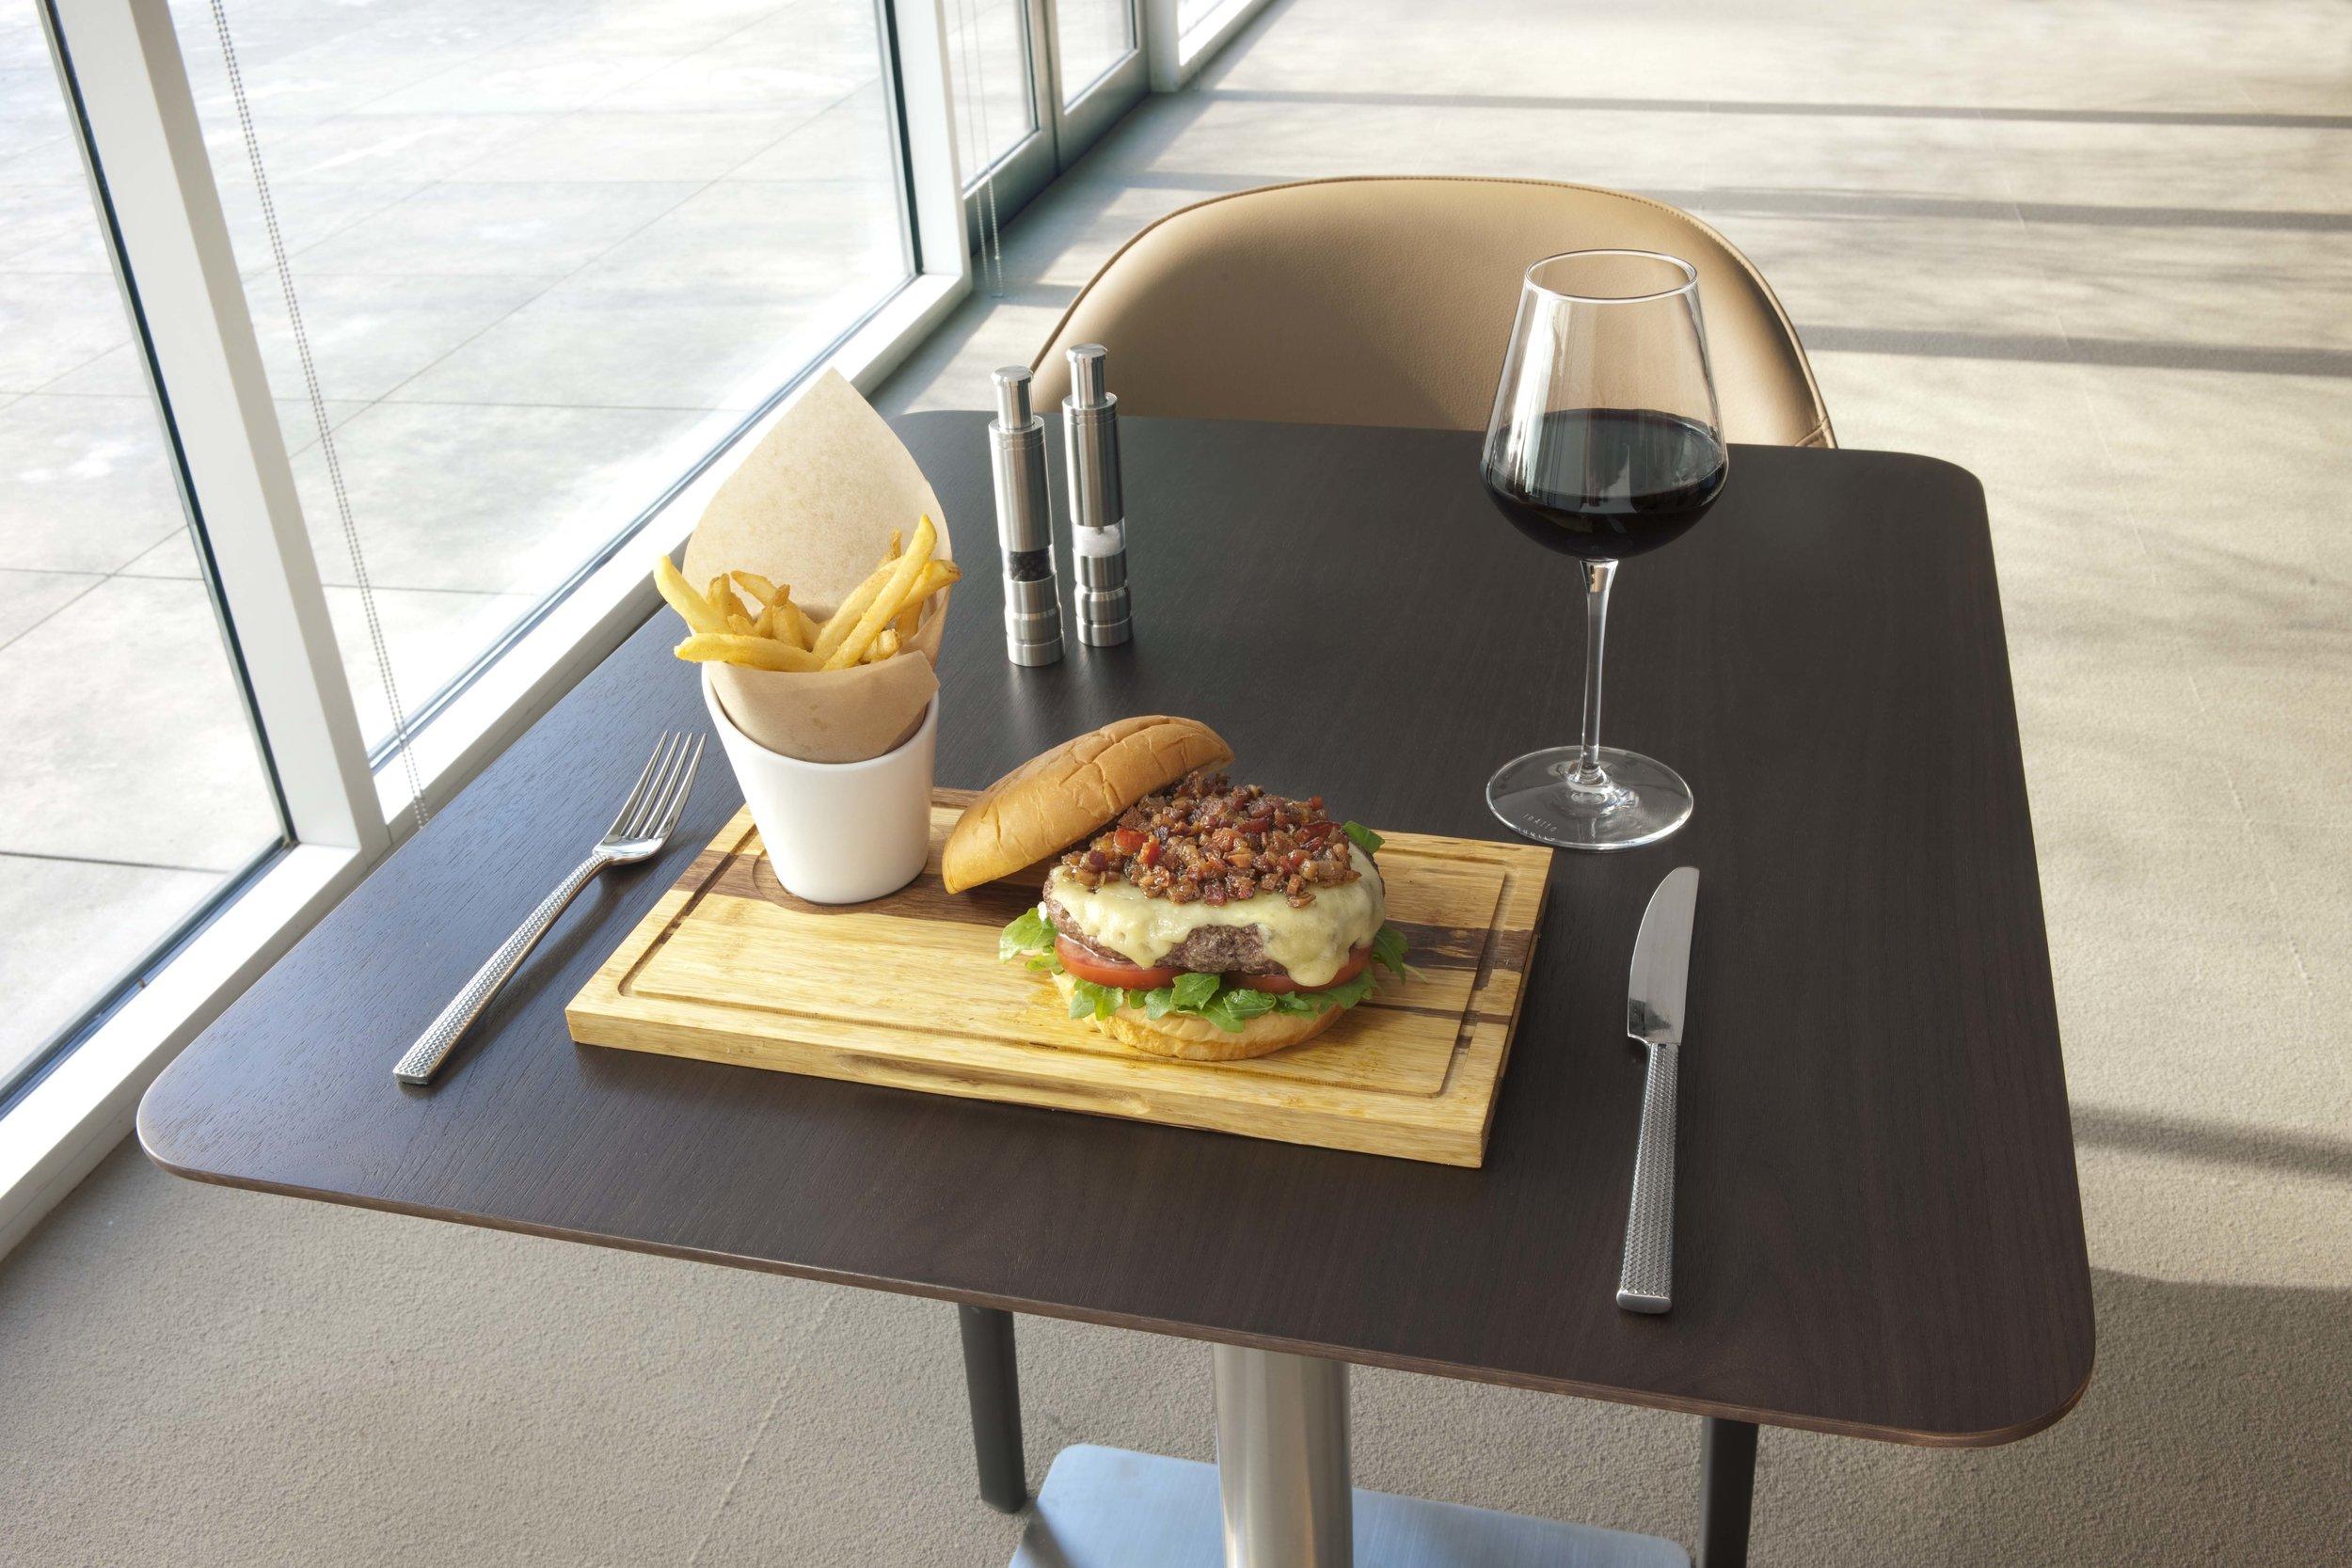 AdmiralsClub-hamburger-and-fries.jpg